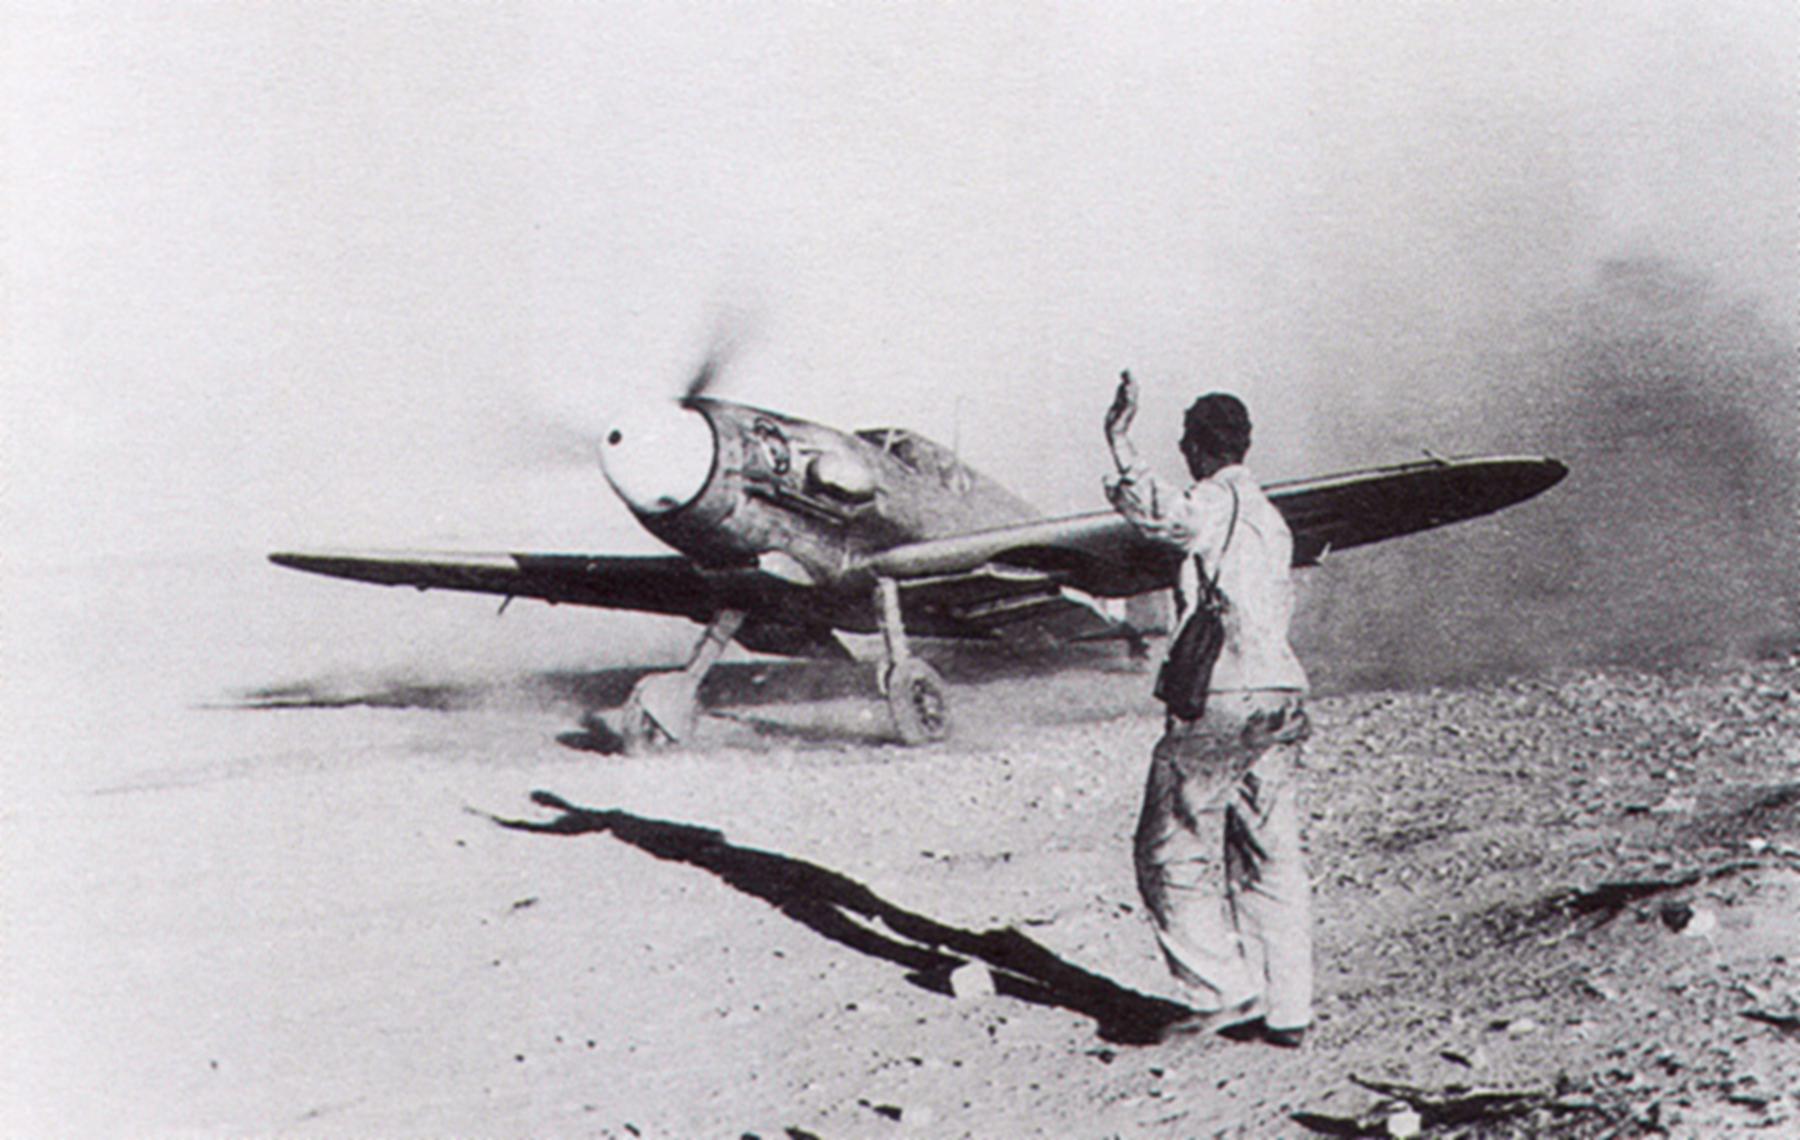 Messerschmitt Bf 109F4Trop 1.JG27 White 5 Albert Espenlaub El Adem Nov 25 1941 02